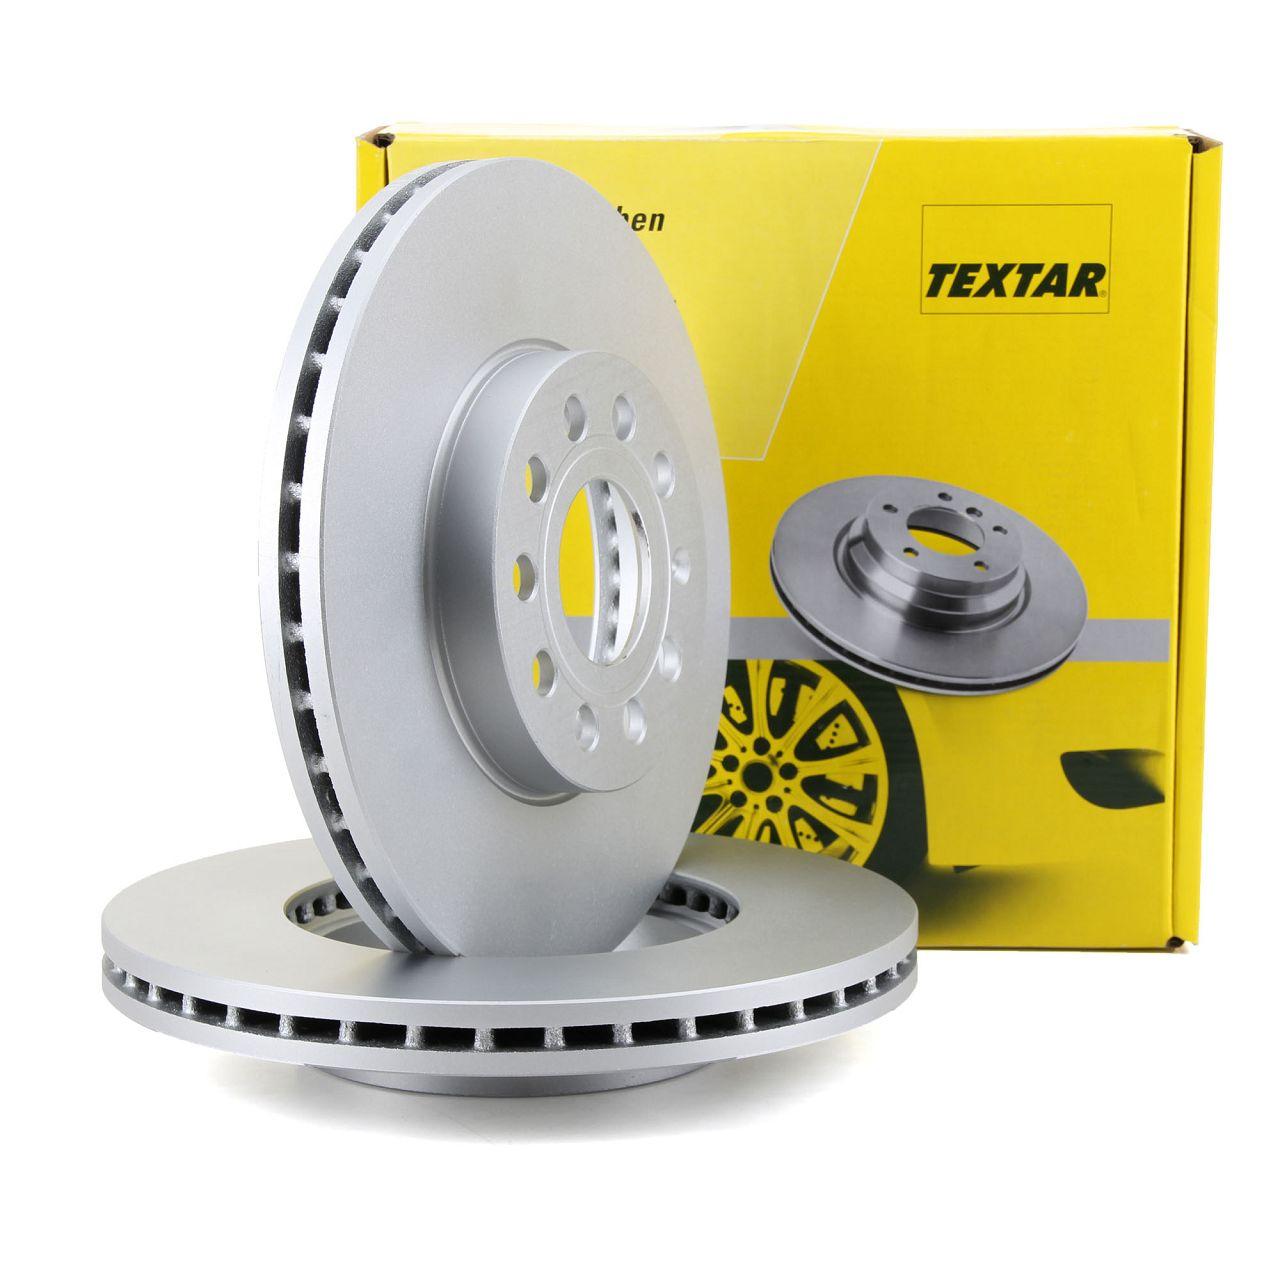 TEXTAR 92120805 Bremsscheiben Satz AUDI A3 8P 8V VW Golf 5 6 7 Polo Touran vorne